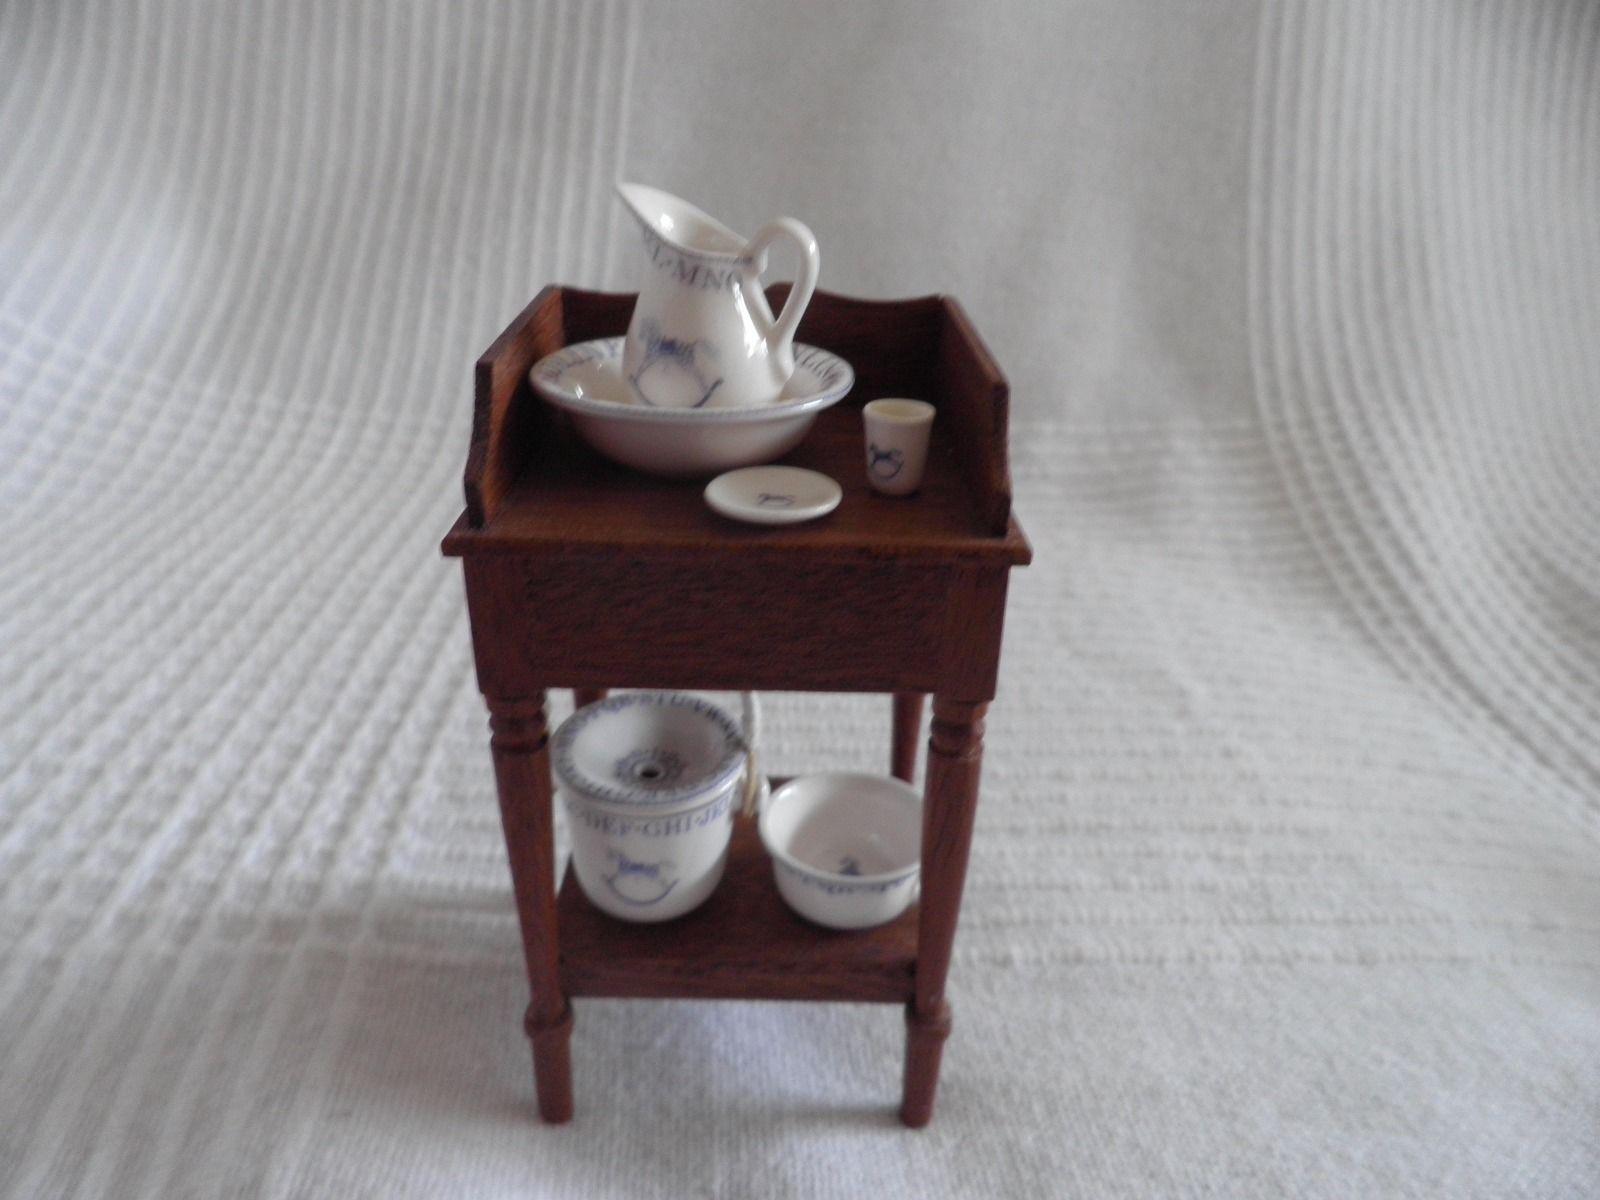 House miniature 1 12 scale bathroom walnut victorian bath tub amp boiler - 1 12th Scale Stokesay Ware Victorian Nursery Potty